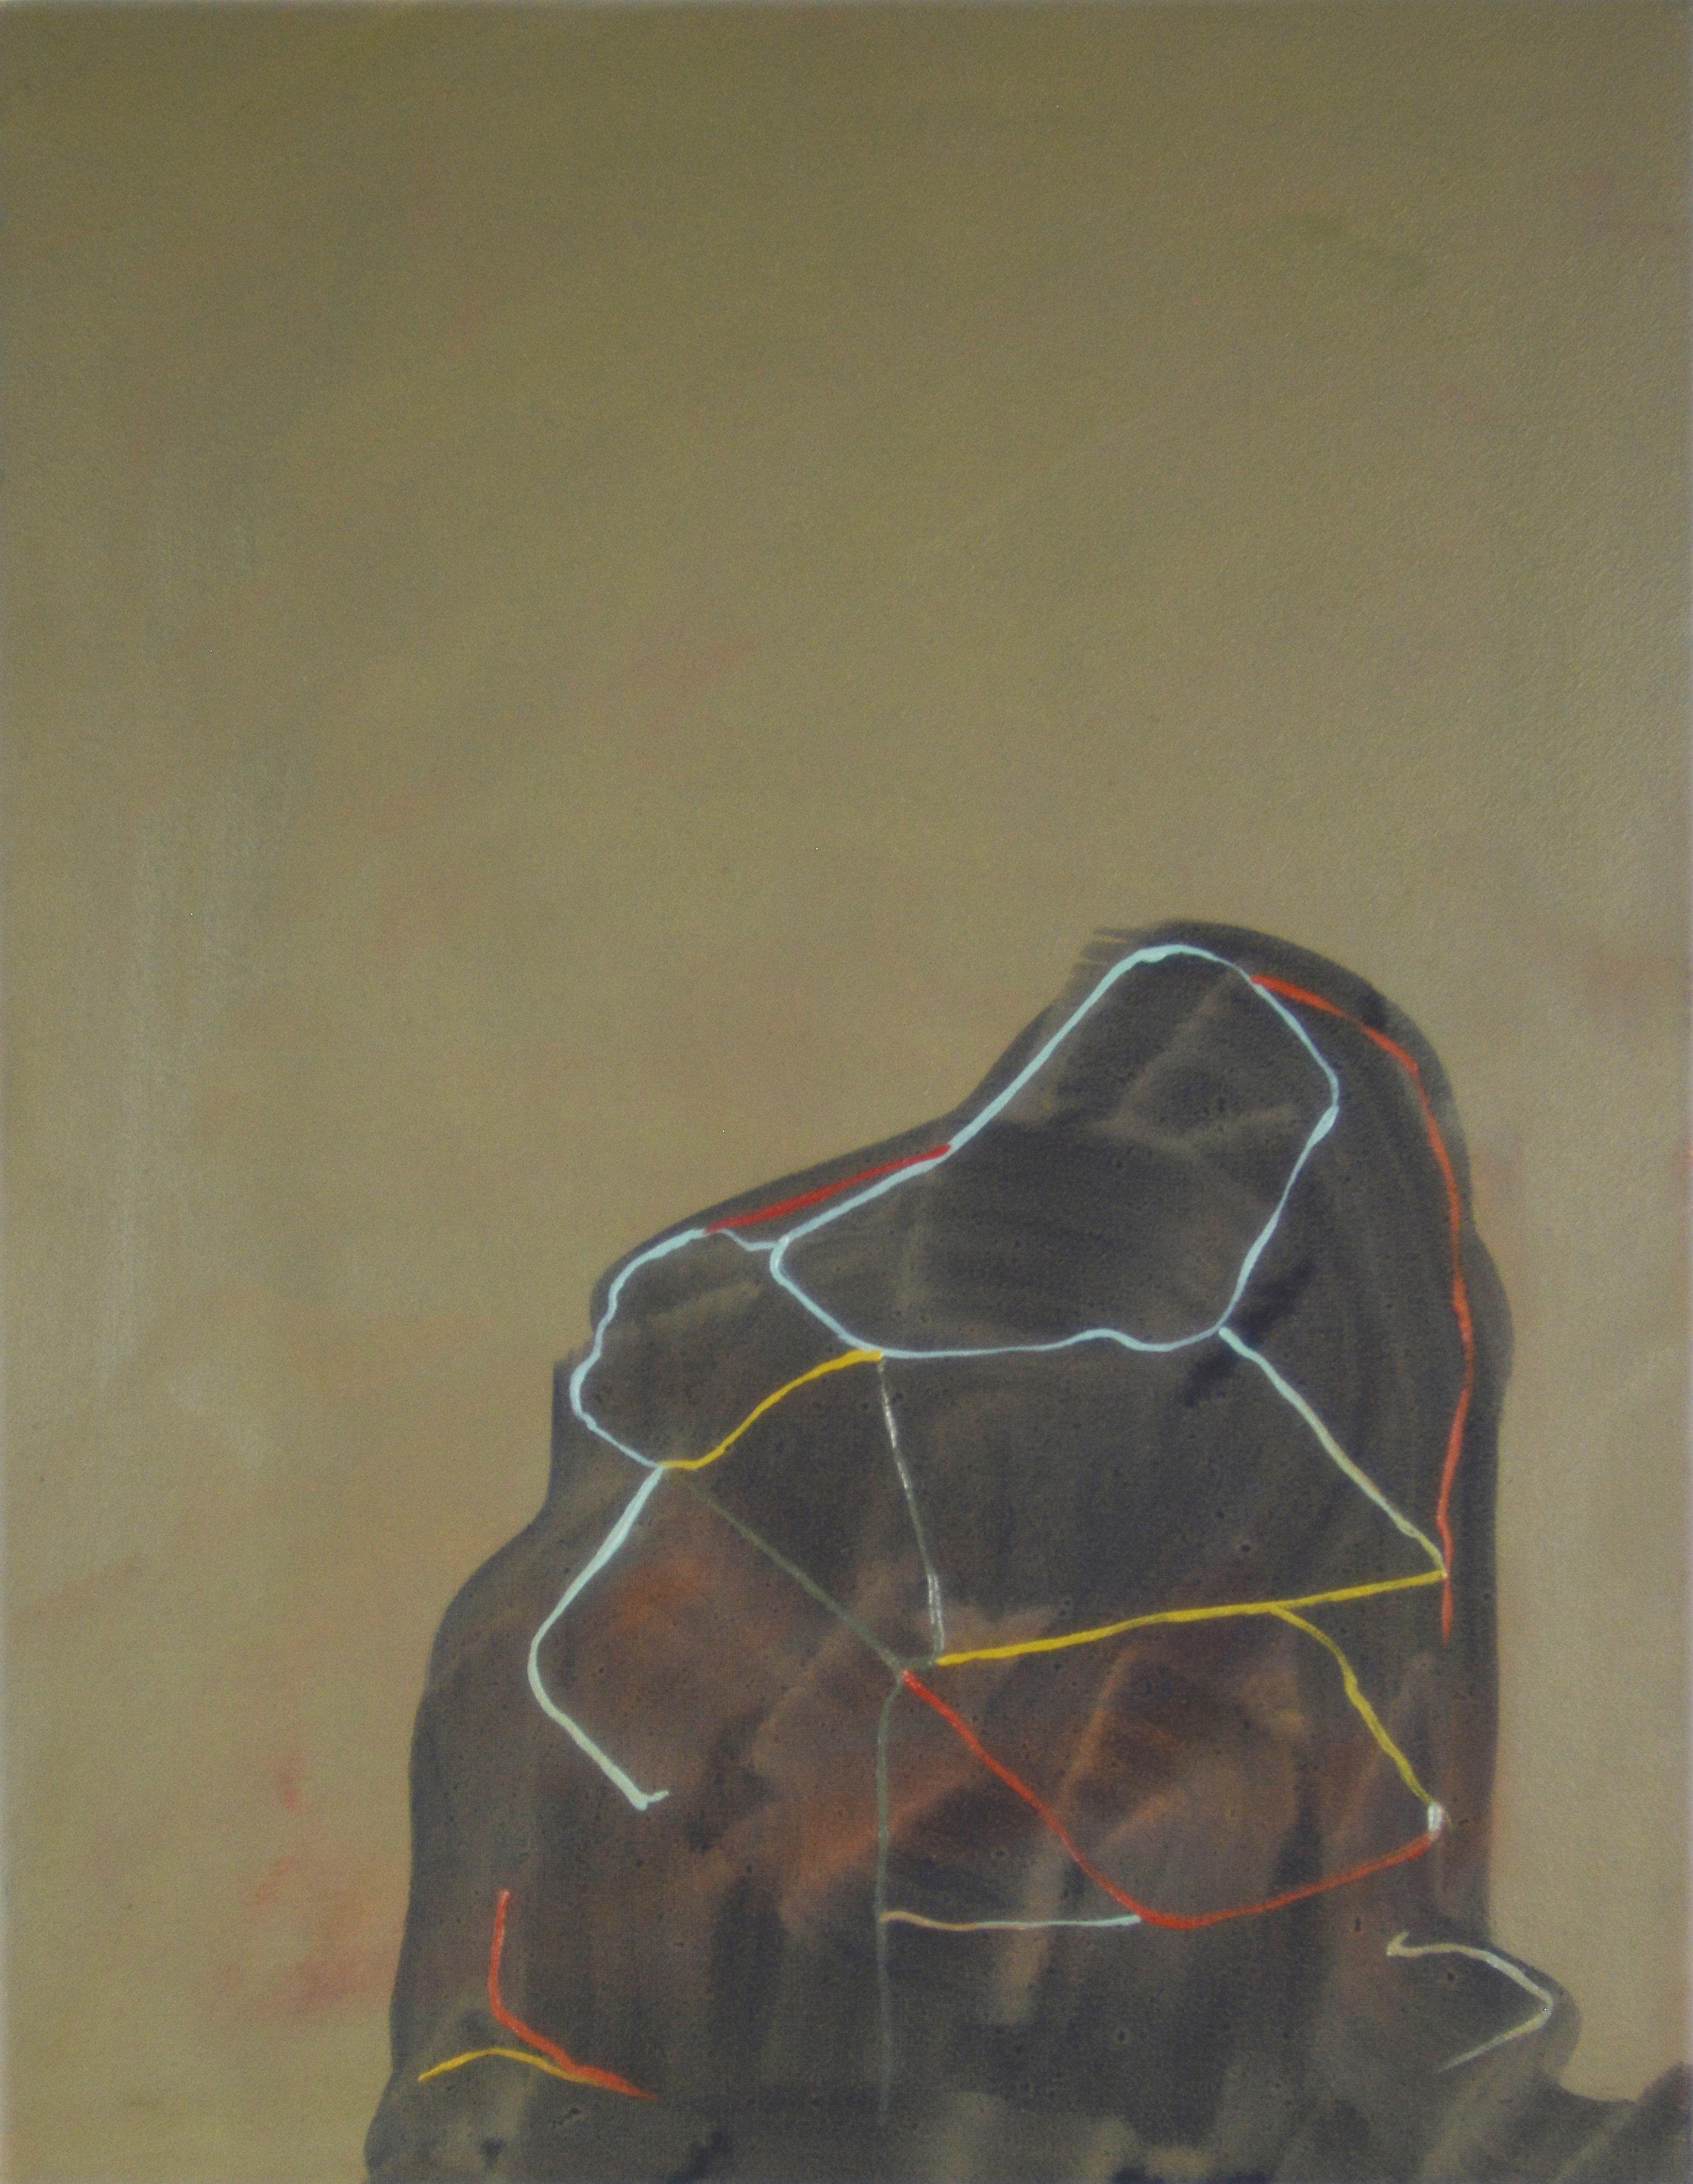 String, 2013, Oil on canvas, 40 x 30 cm